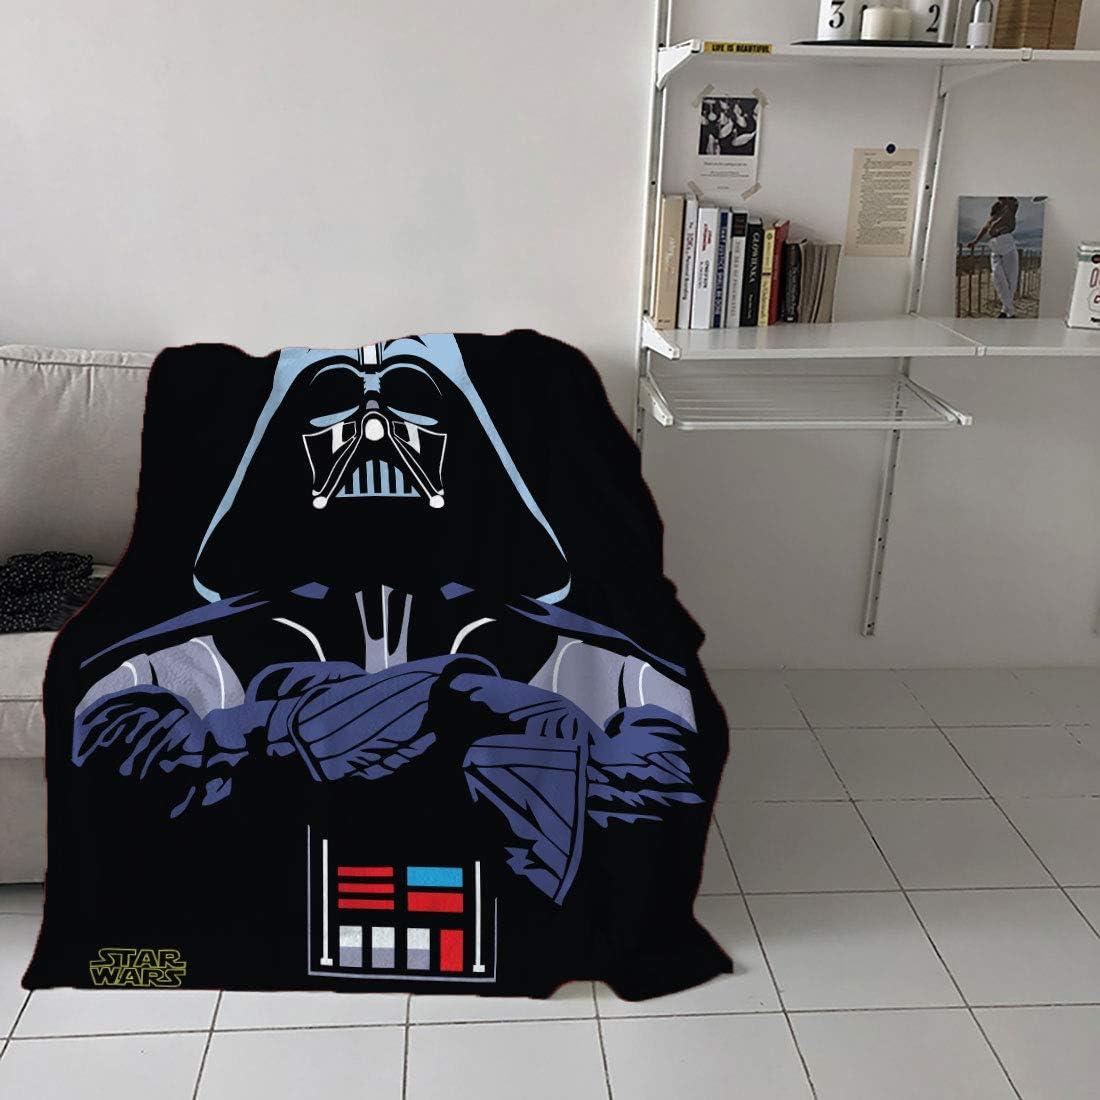 OBI Wan Fuzzy Flannel Blanket Throw Anti-Static Lightweight Microfiber Star Wars Lightsaber Soft Fleece Throw Blanket 40 x 50